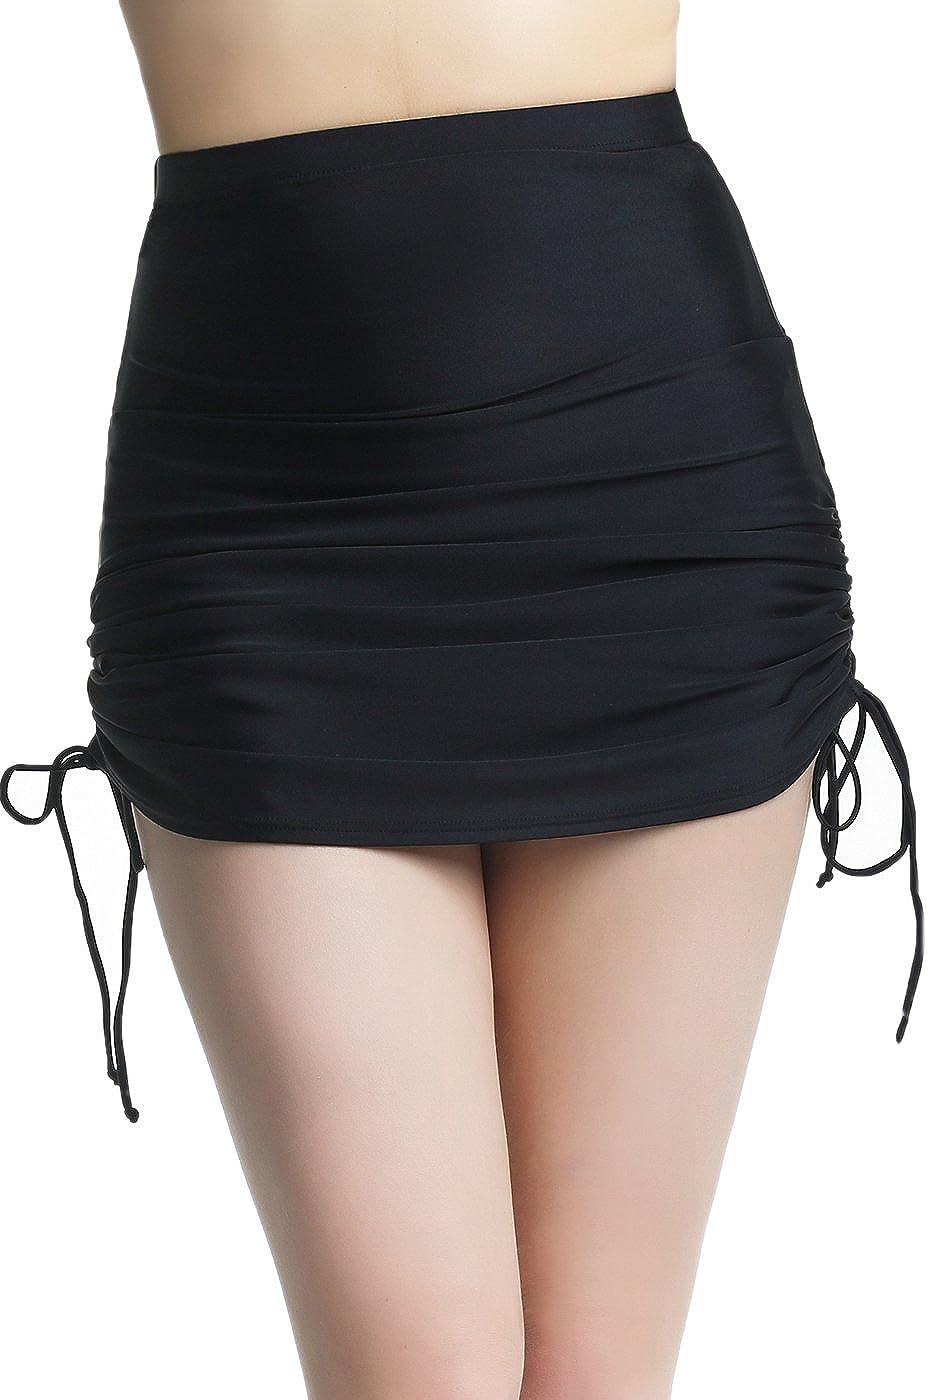 216fe968026d5 High Waisted Swim Skirt Bottoms Plus Size